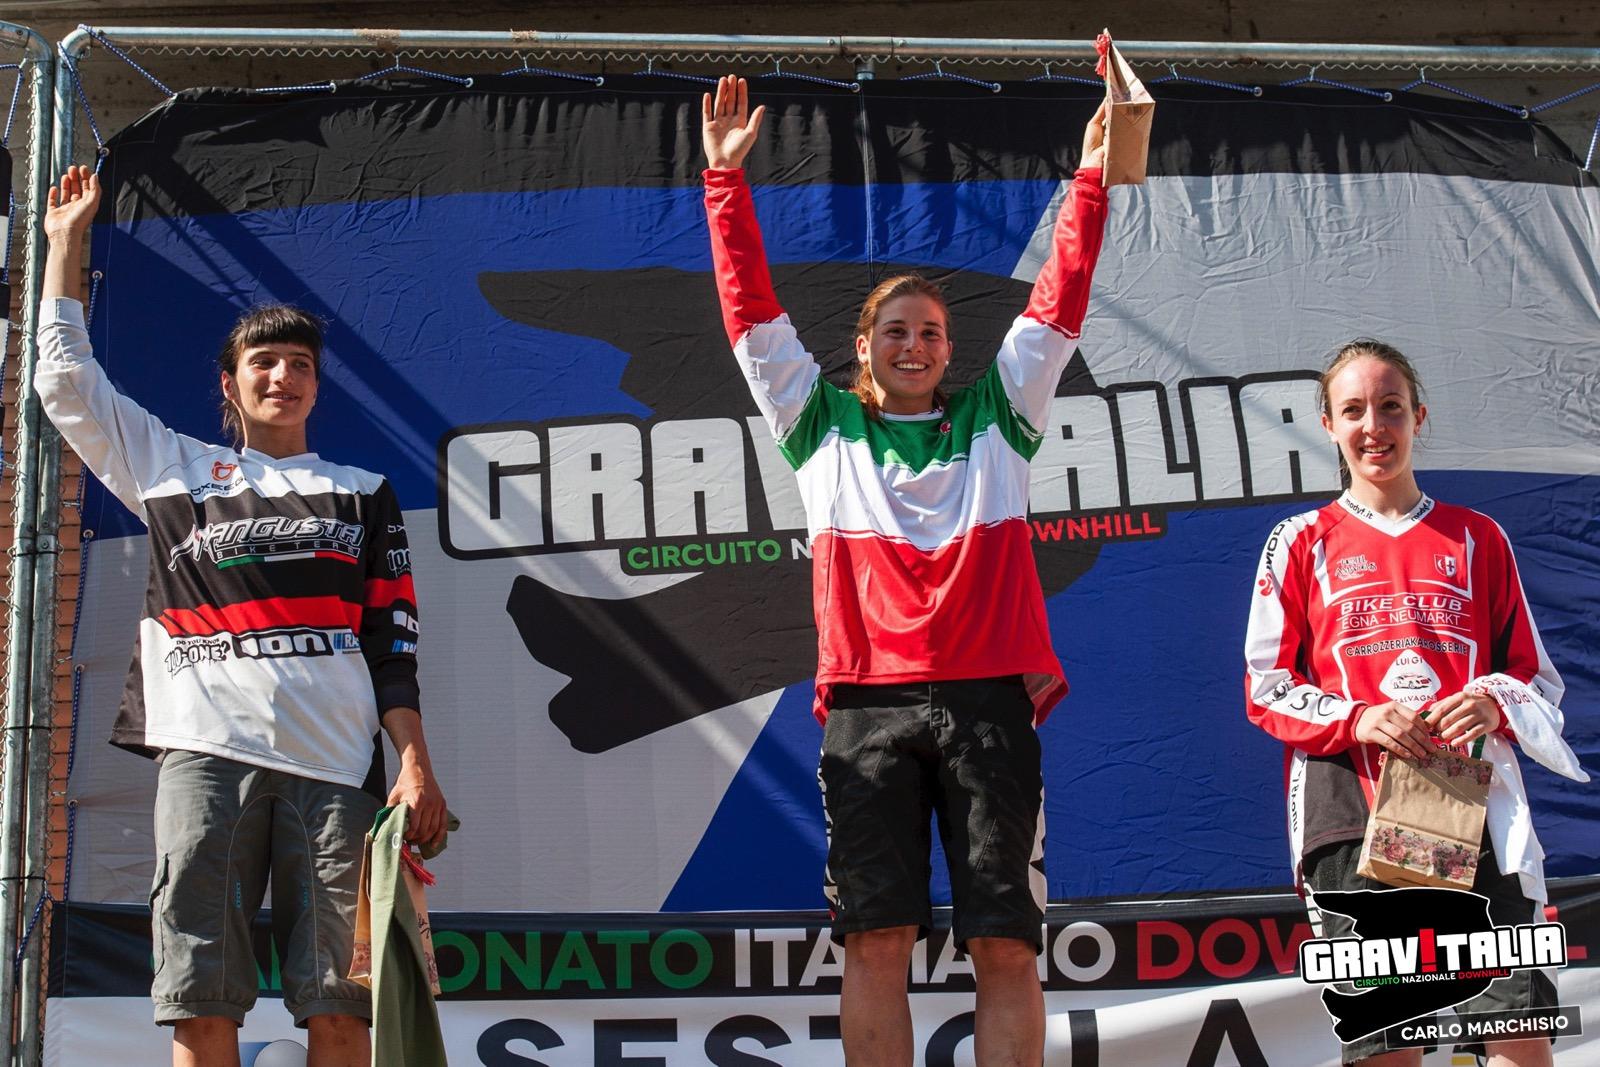 PhotoCarloMarchisio_GIT2015_CampionatiItaliani_Sestola_081